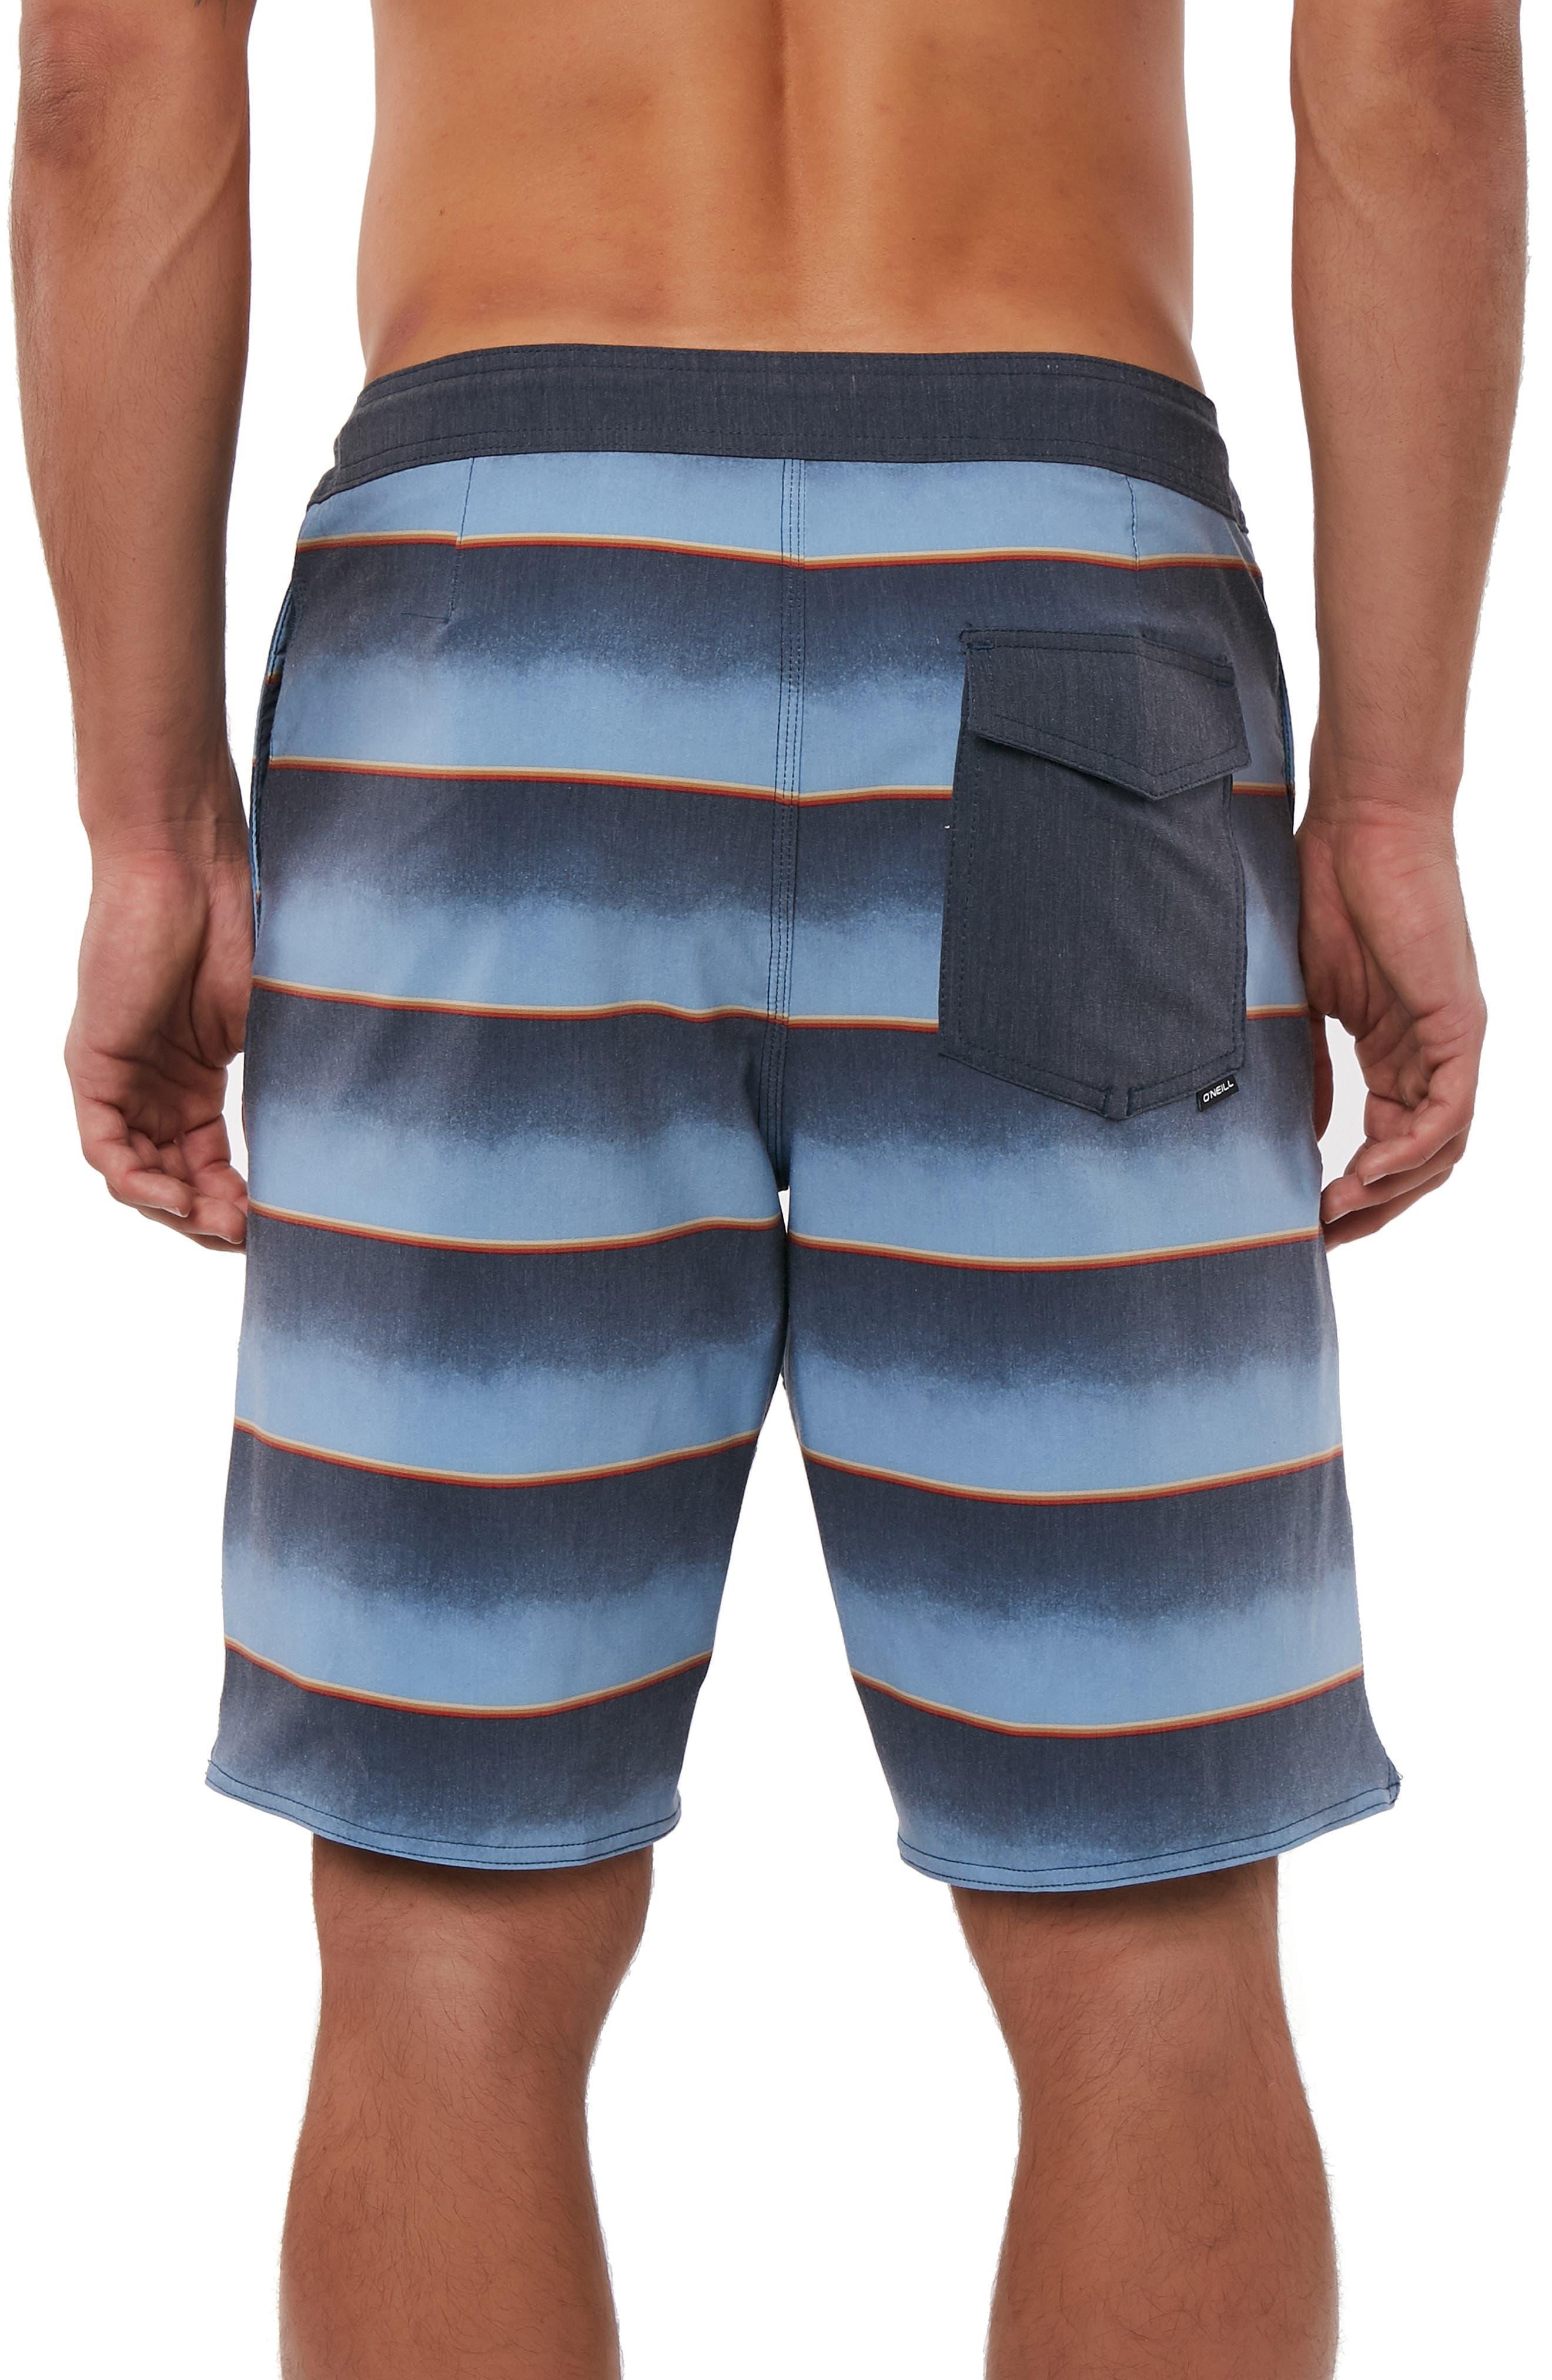 Tidelines Cruzer Board Shorts,                             Alternate thumbnail 2, color,                             NAVY